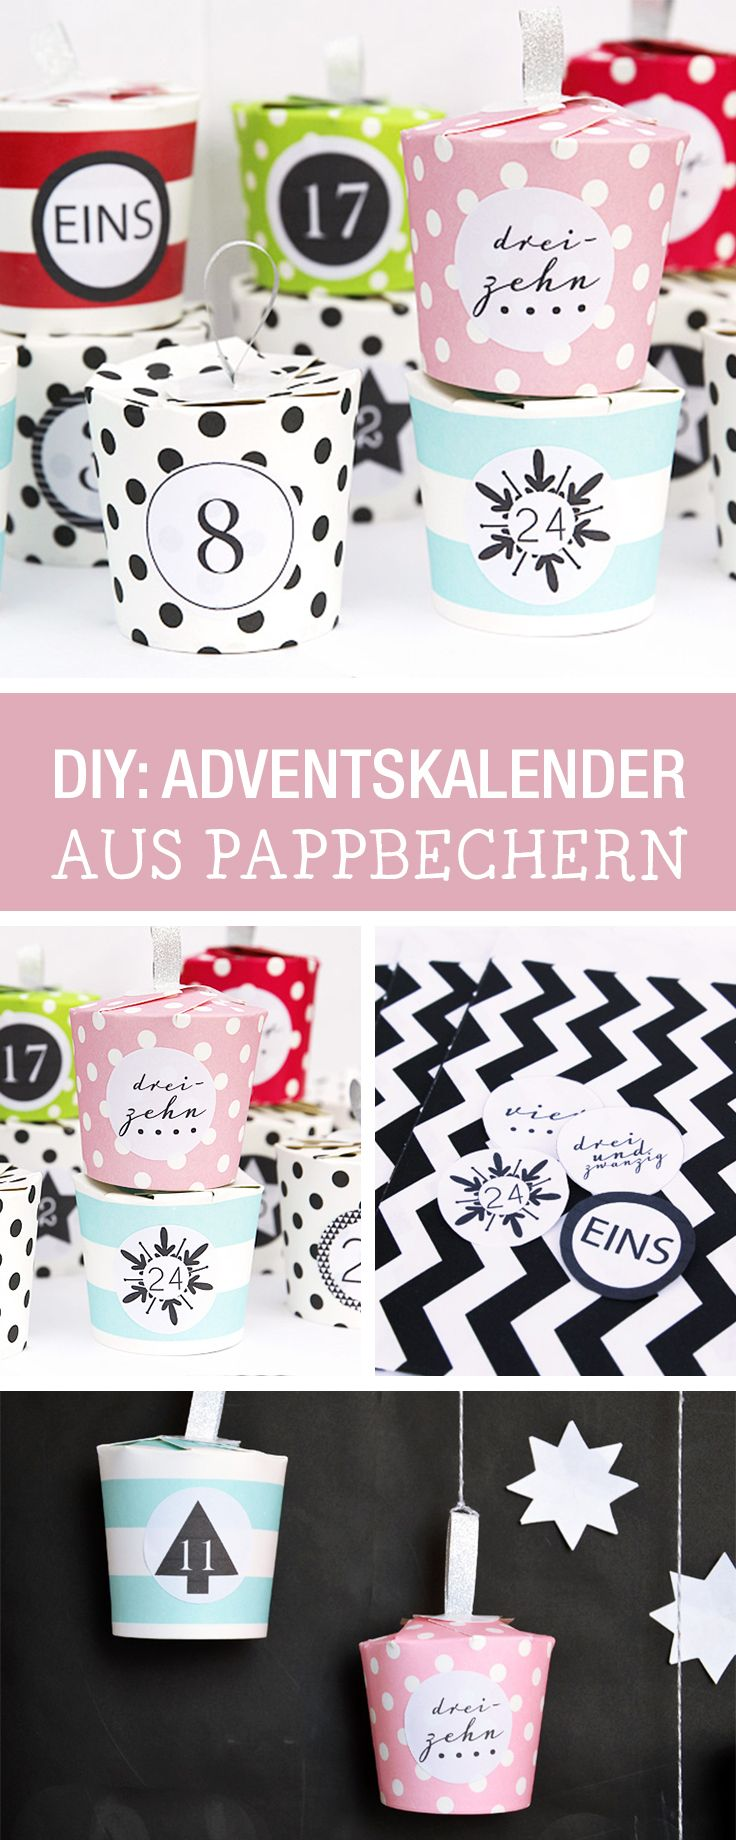 143 best images about adventskalender diy on pinterest basteln fabric advent calendar and advent - Adventskalender pinterest ...